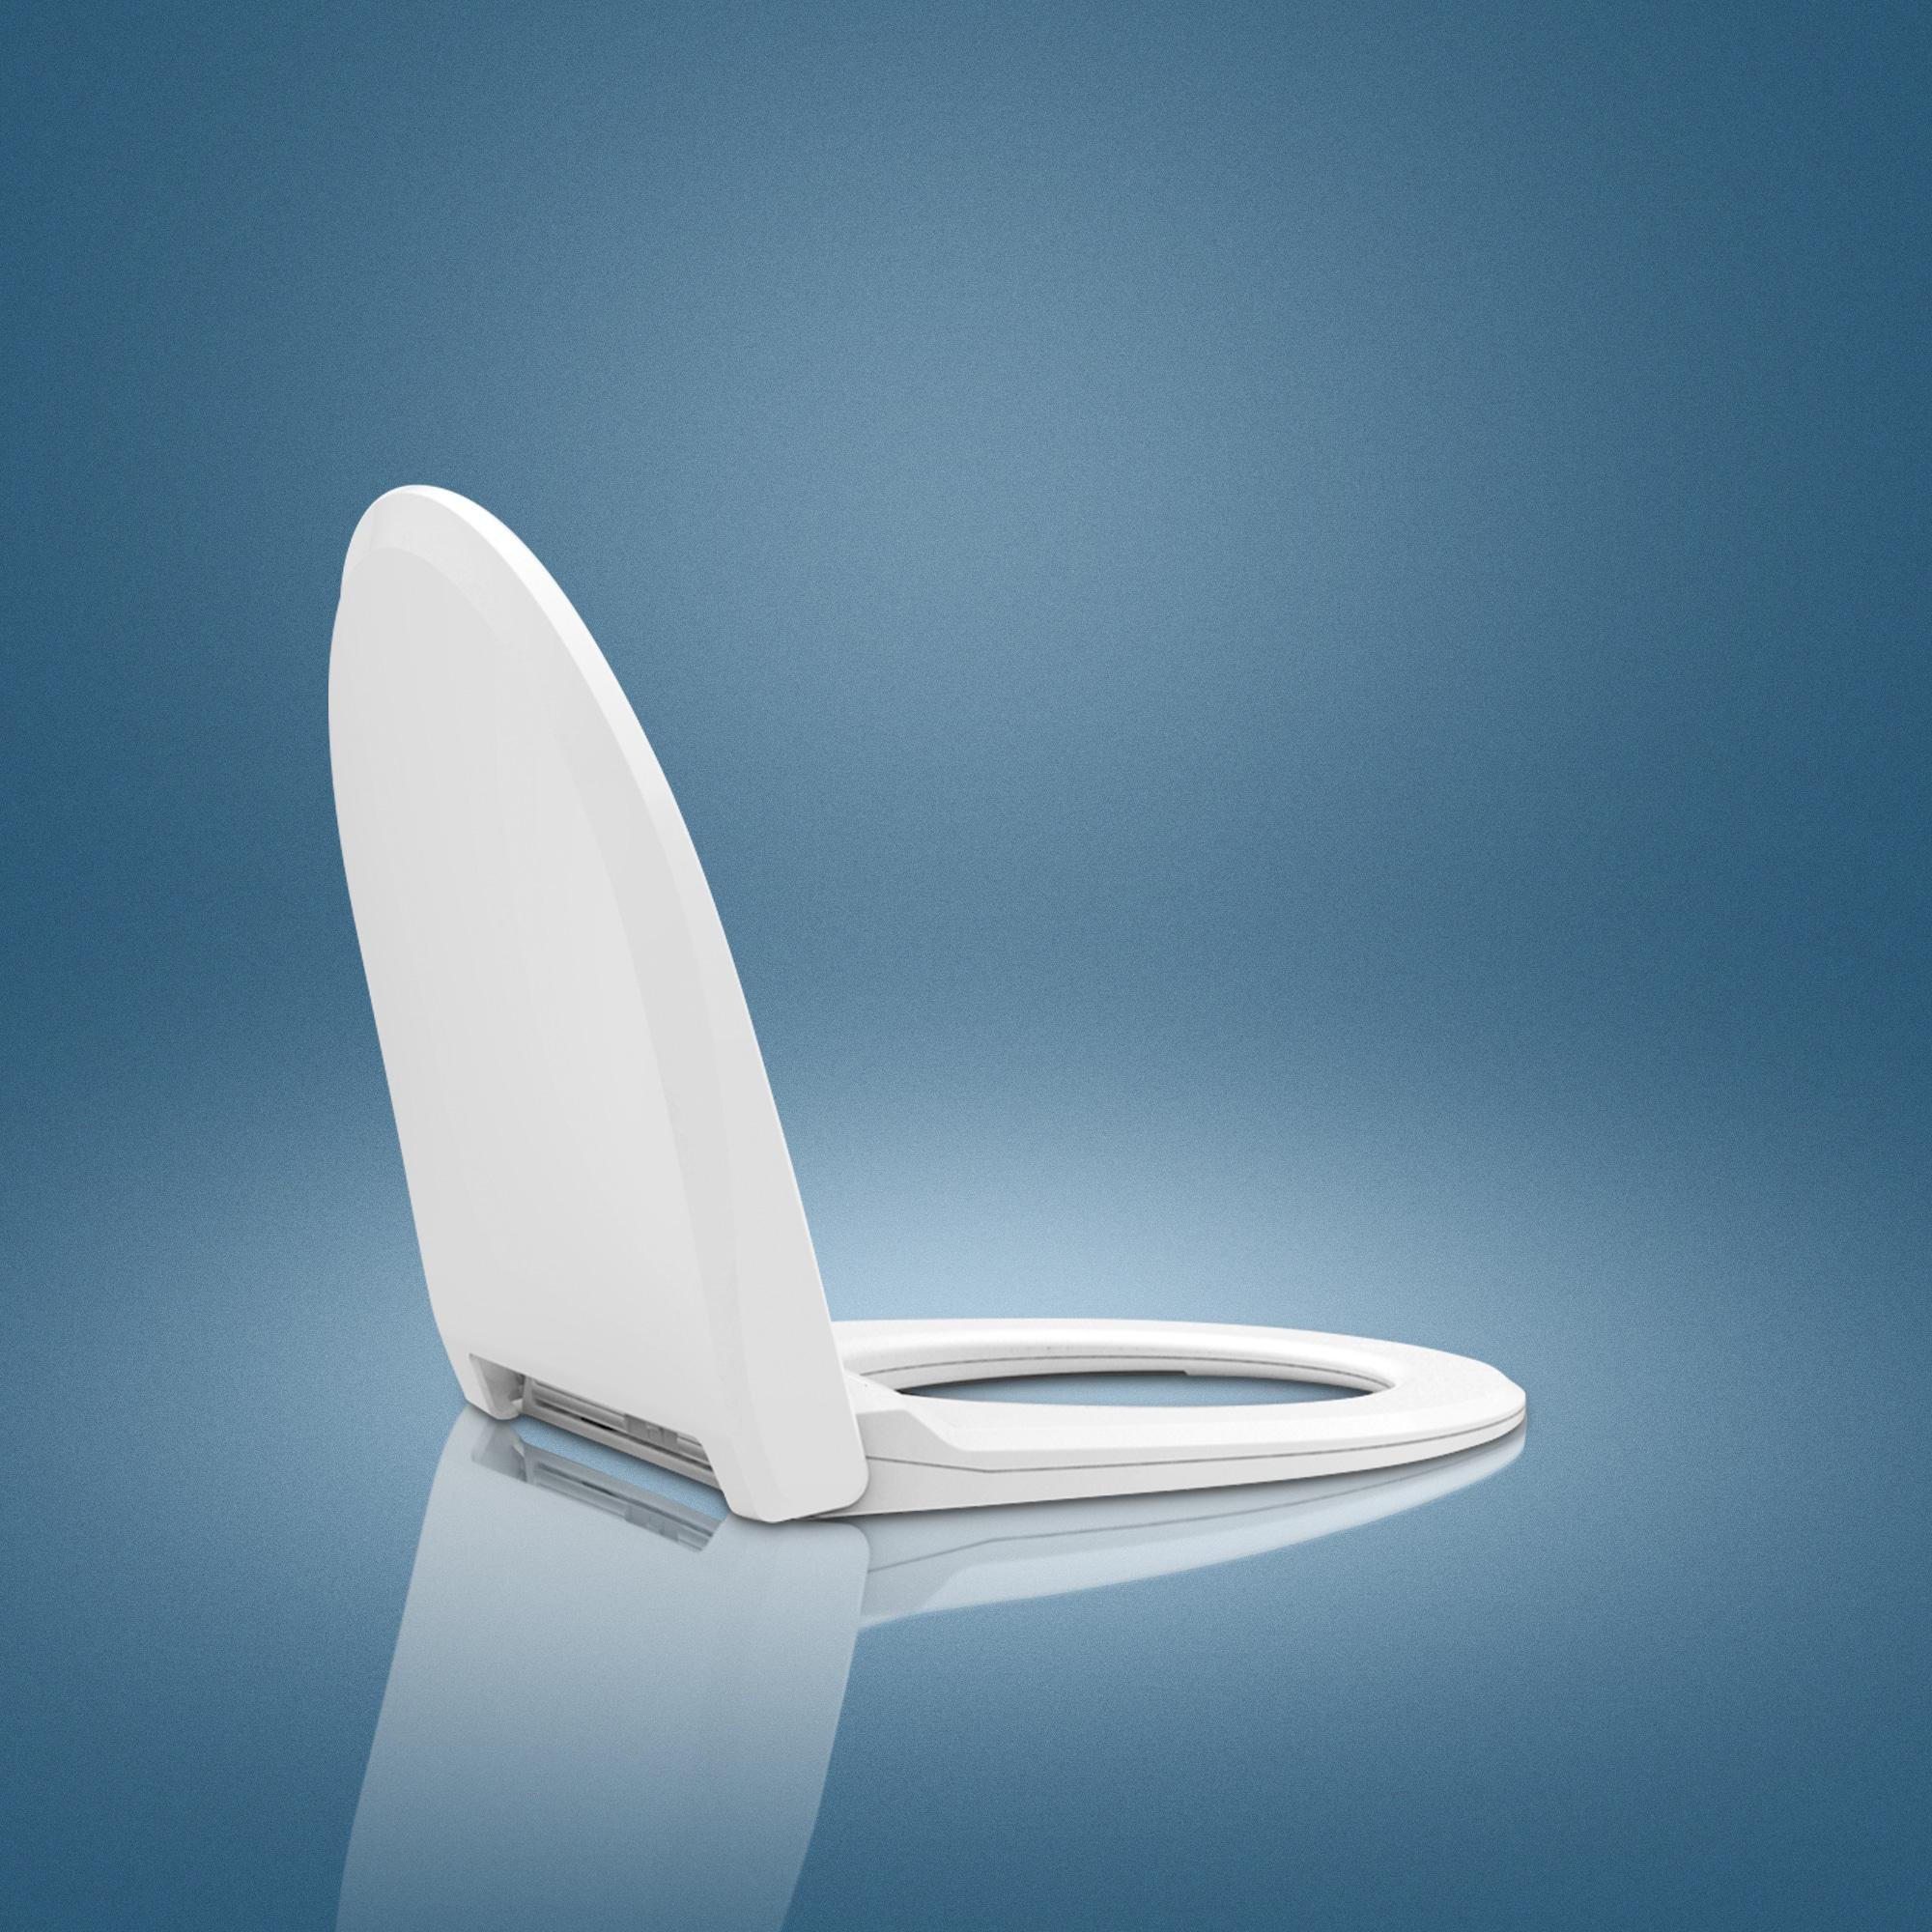 belair-3000-toilet-seat-with-virus-filter